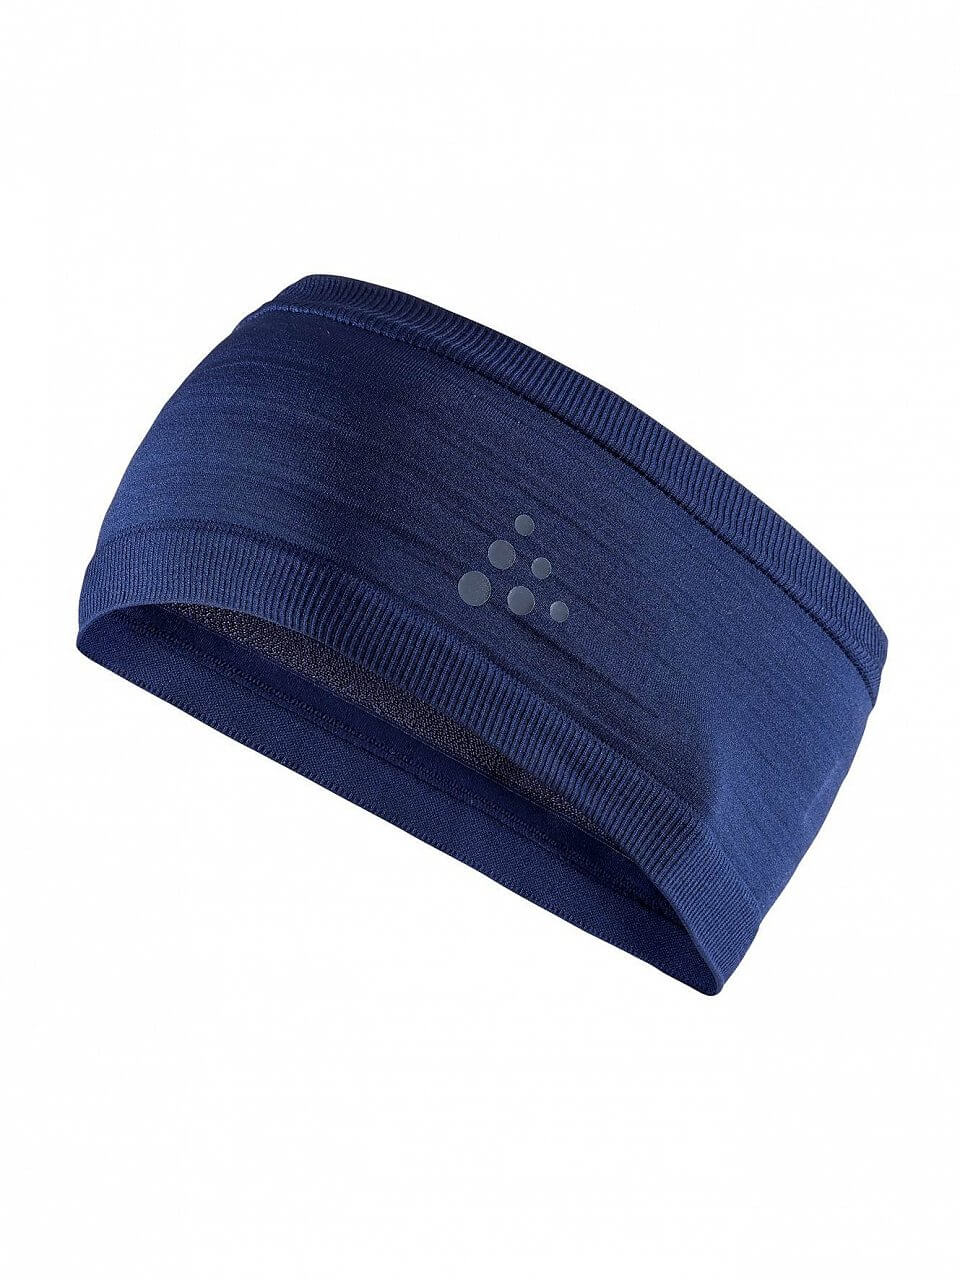 Craft Čelenka Warm Comfort tmavě modrá  cb59e617f6